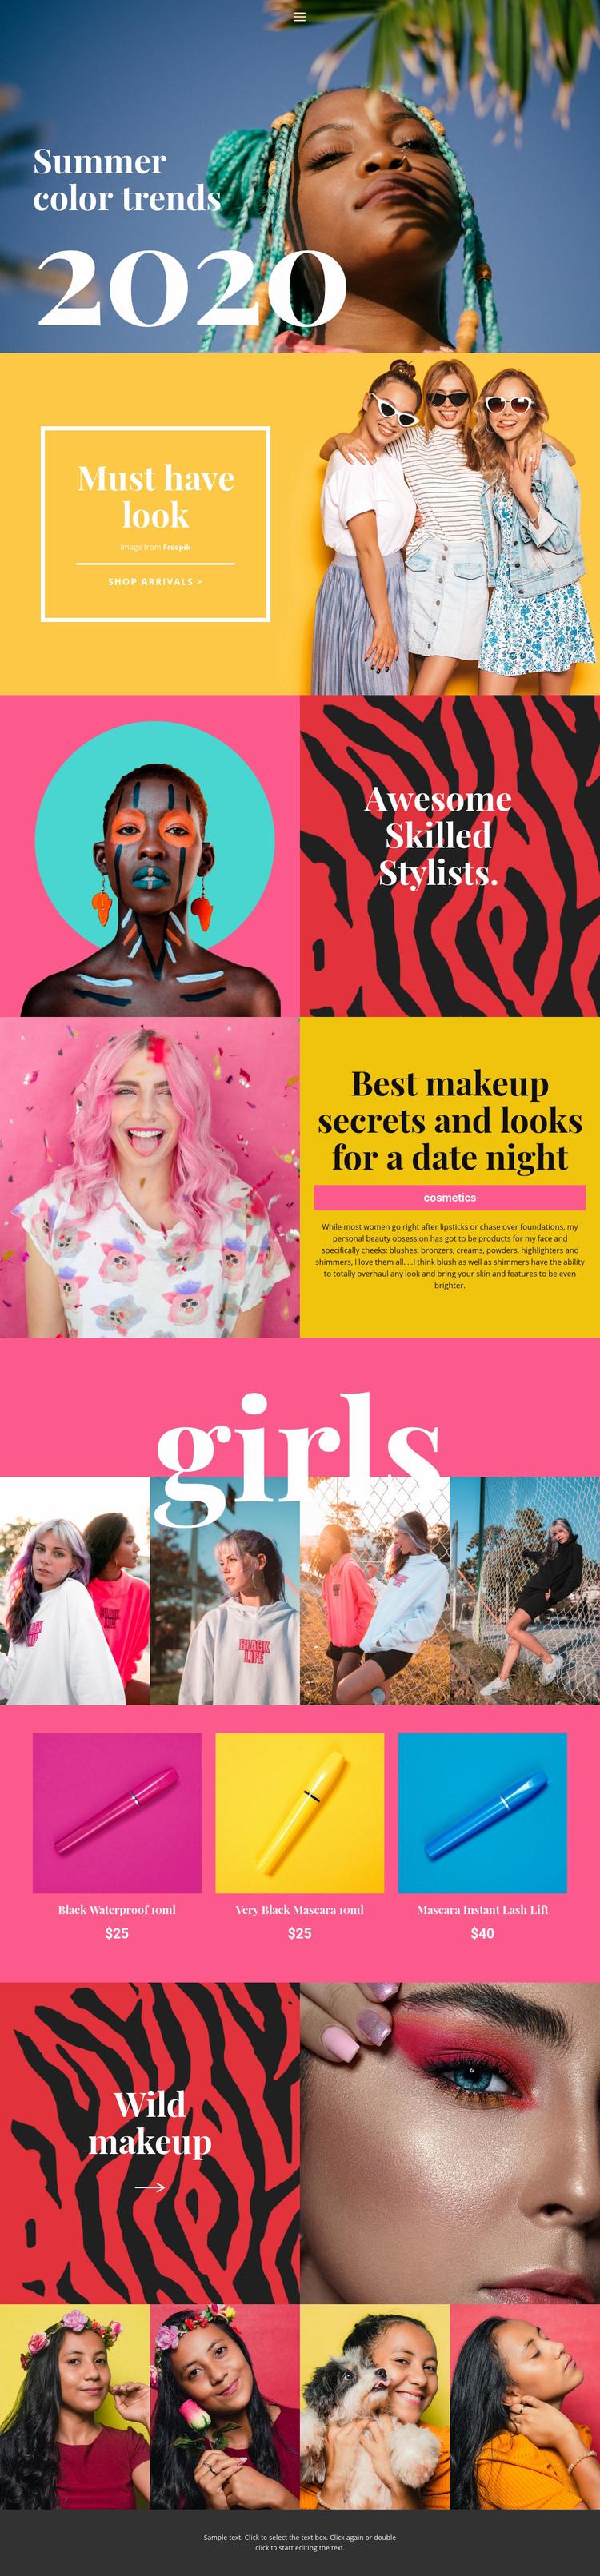 Beauty trends info Web Page Designer